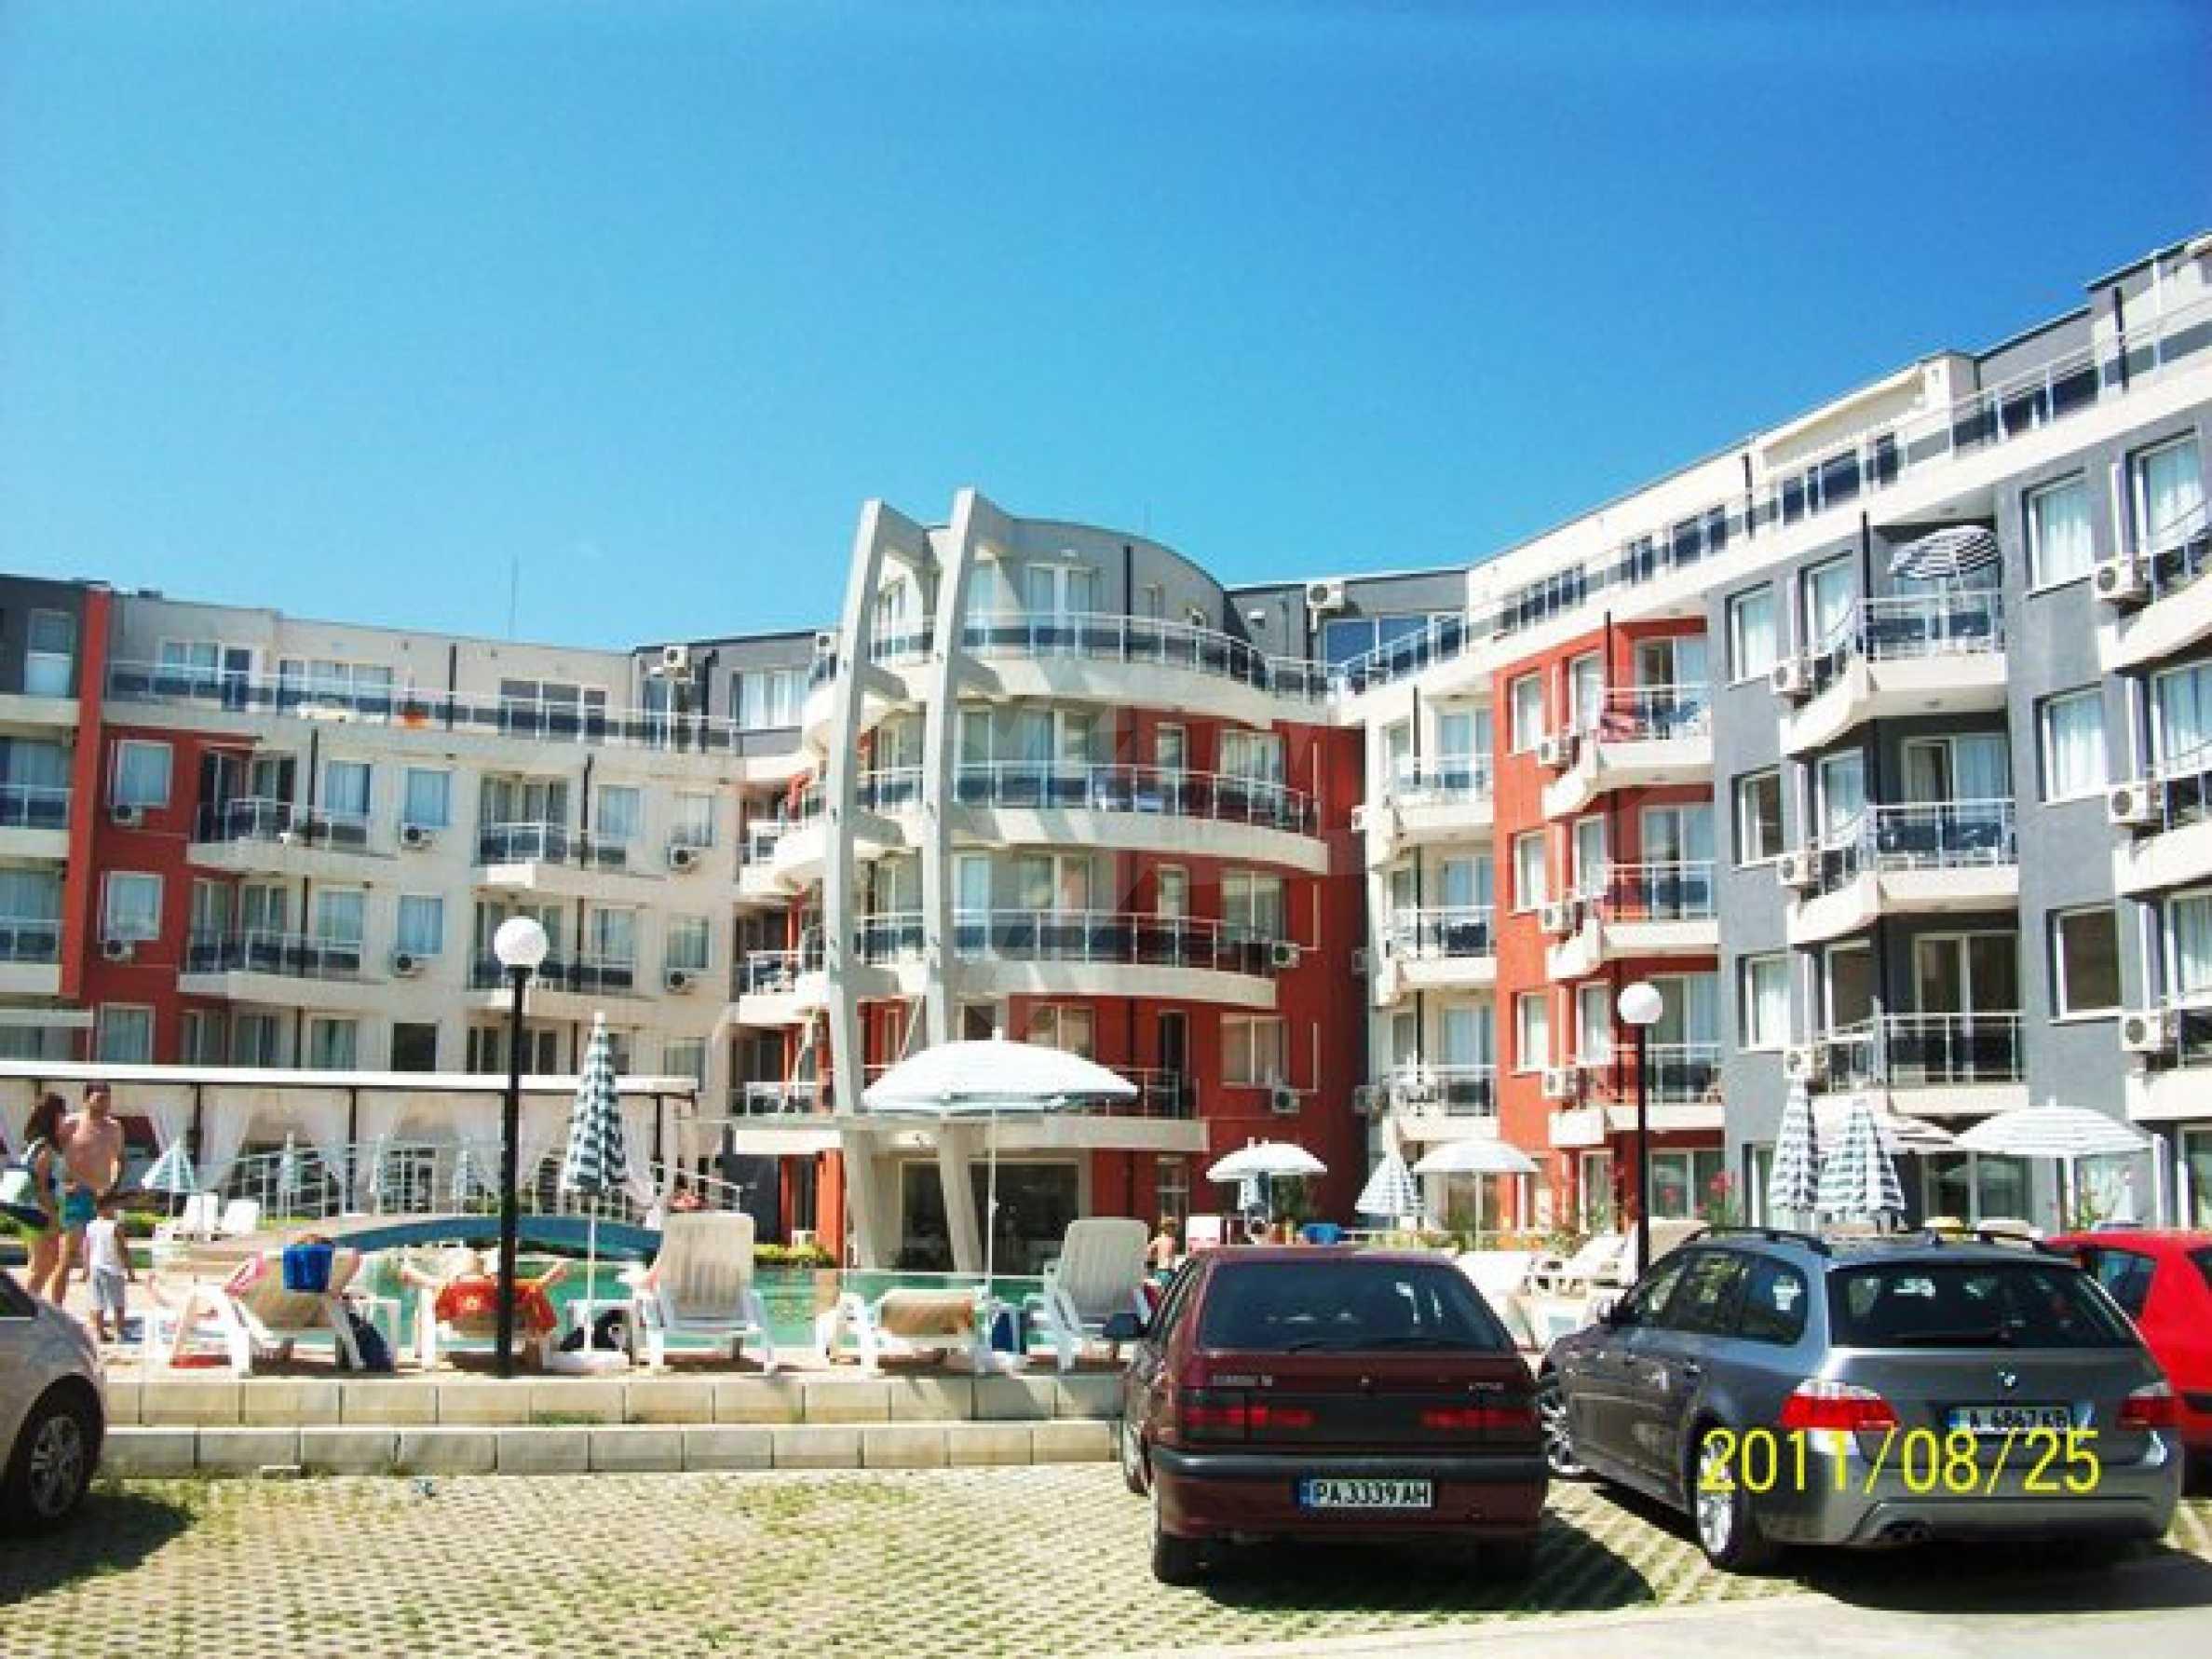 Трехкомнатный апартамент на продажу в комплексе Emberli в курорте Лозенец 3